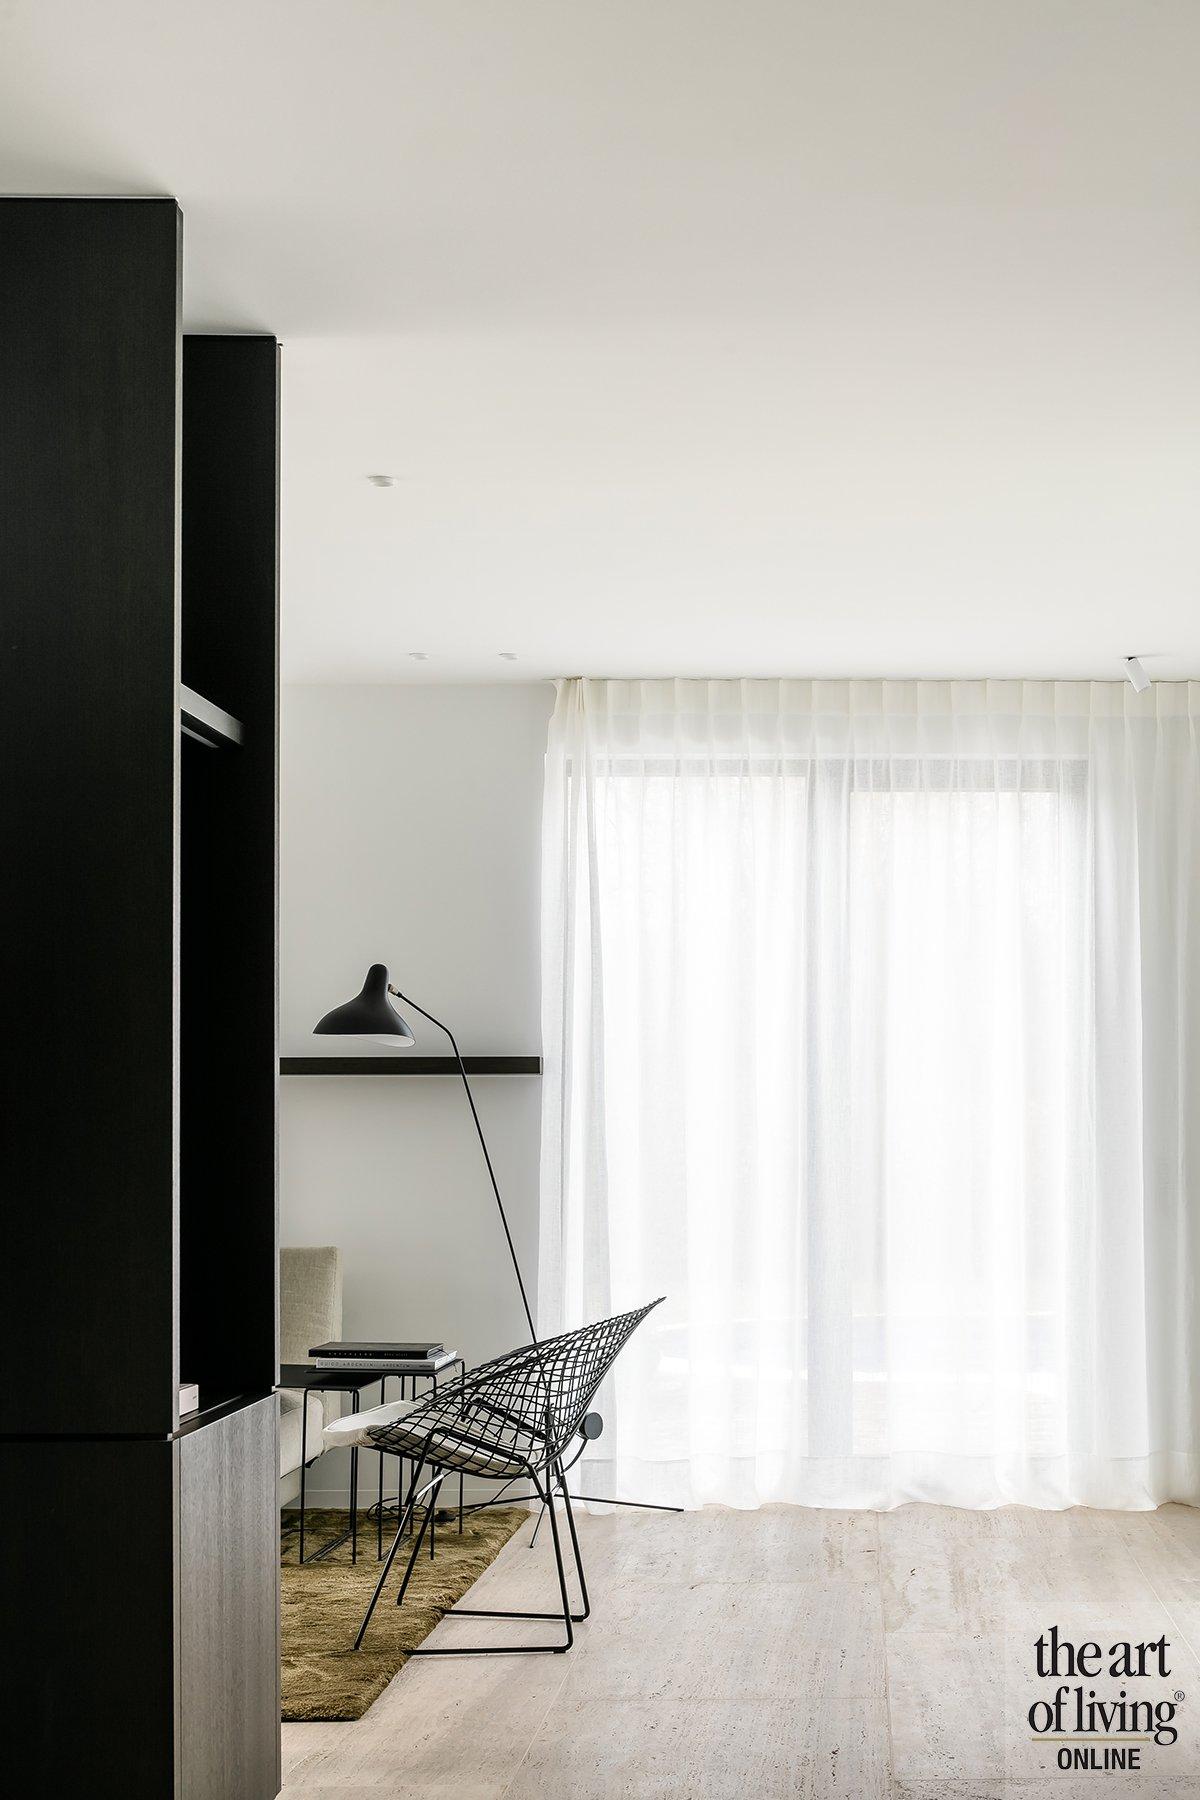 Marmer, Vers Interieur, the art of living